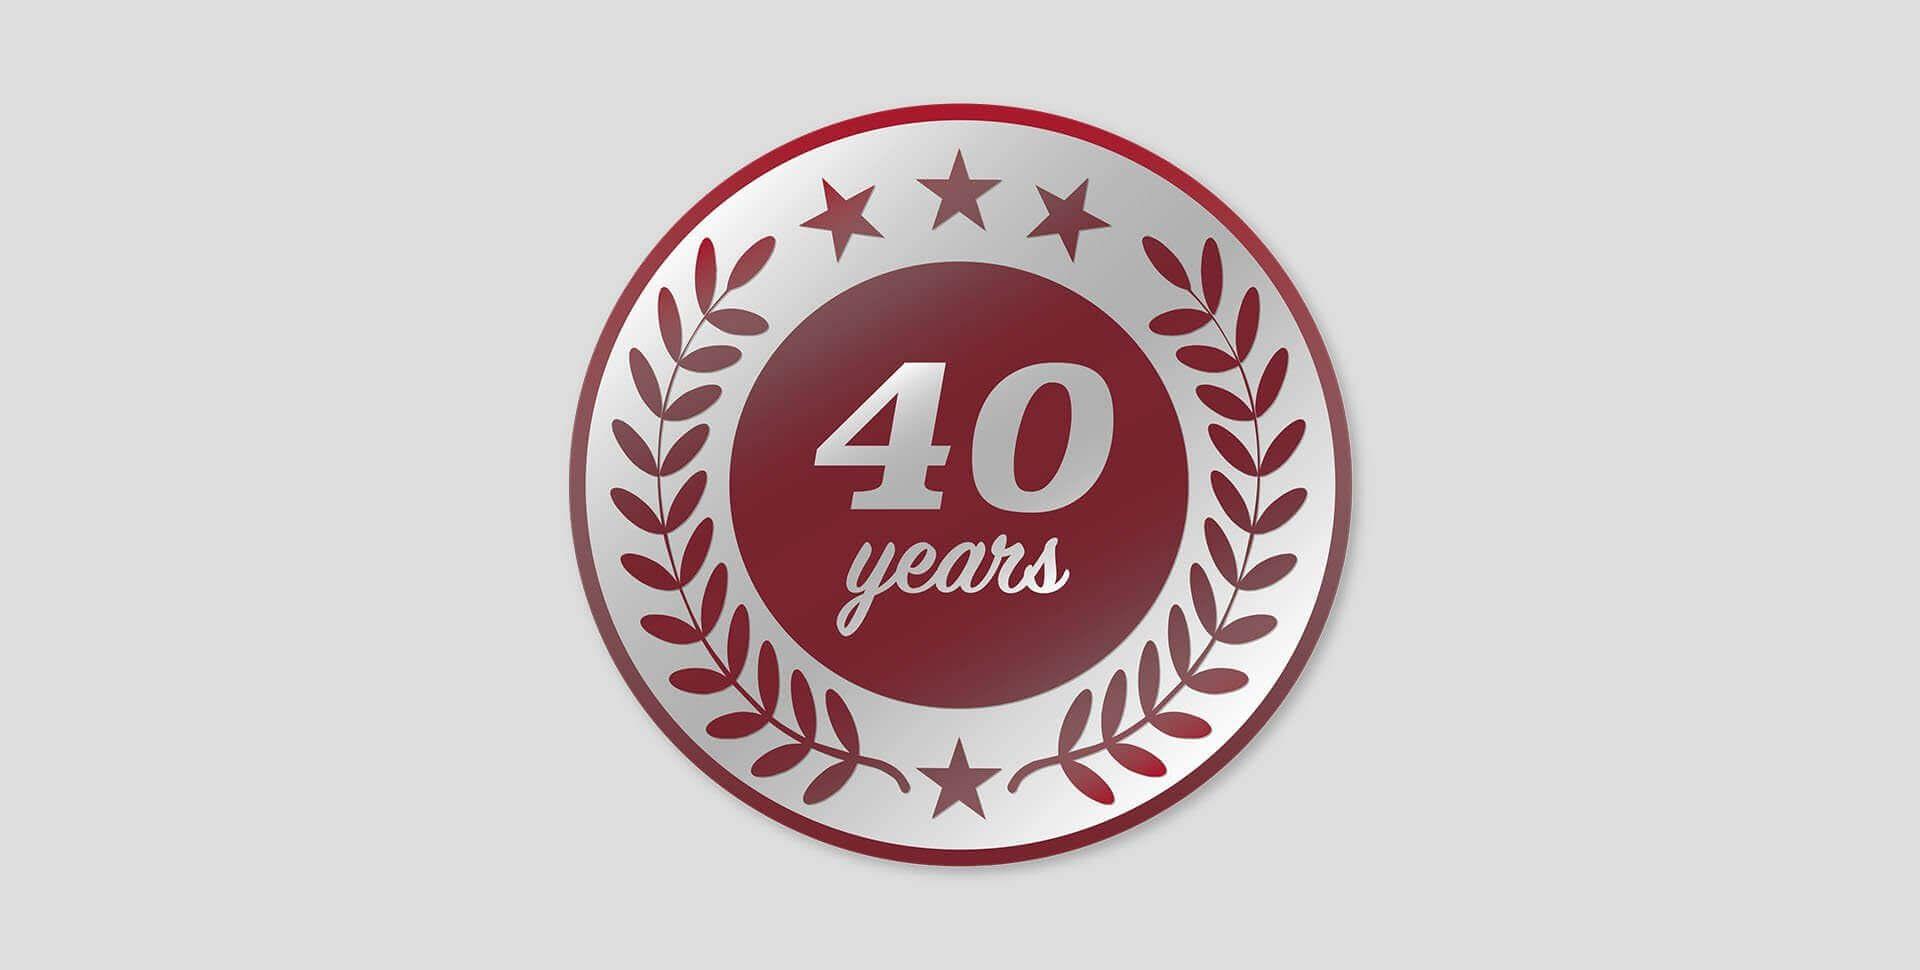 2012 – 40 Years